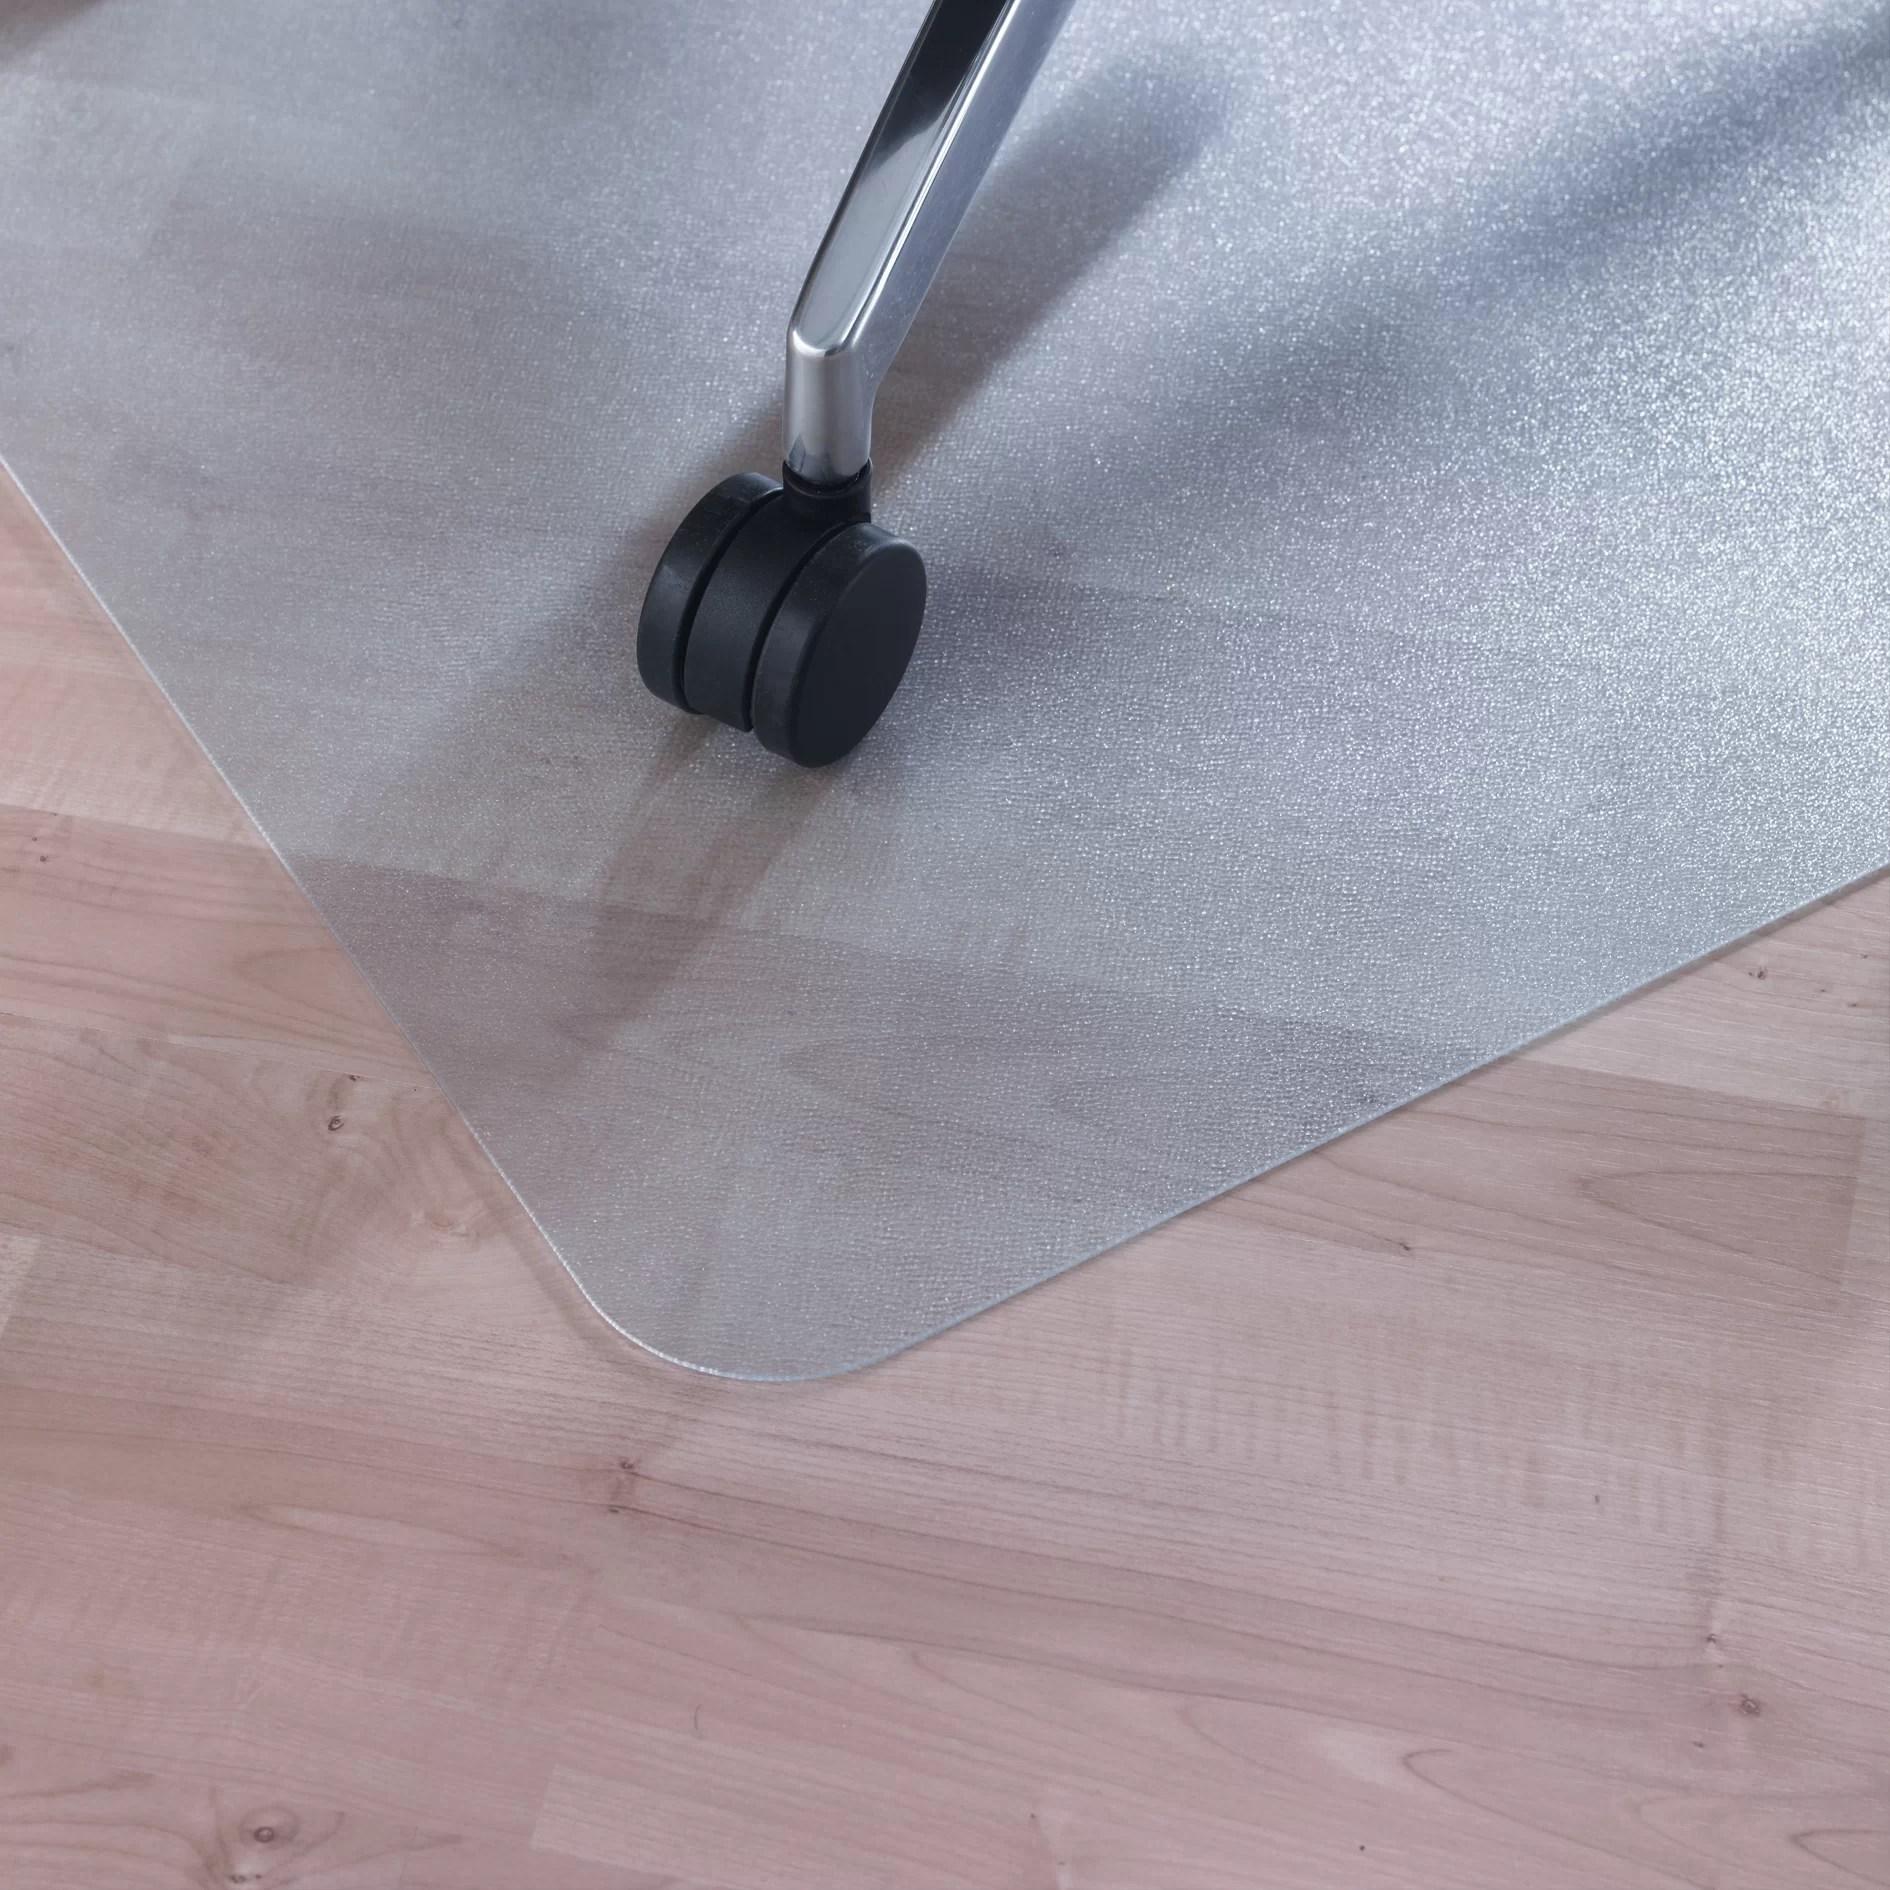 floortex chair mat chiavari chairs rental houston cleartex advantagemat hard floor